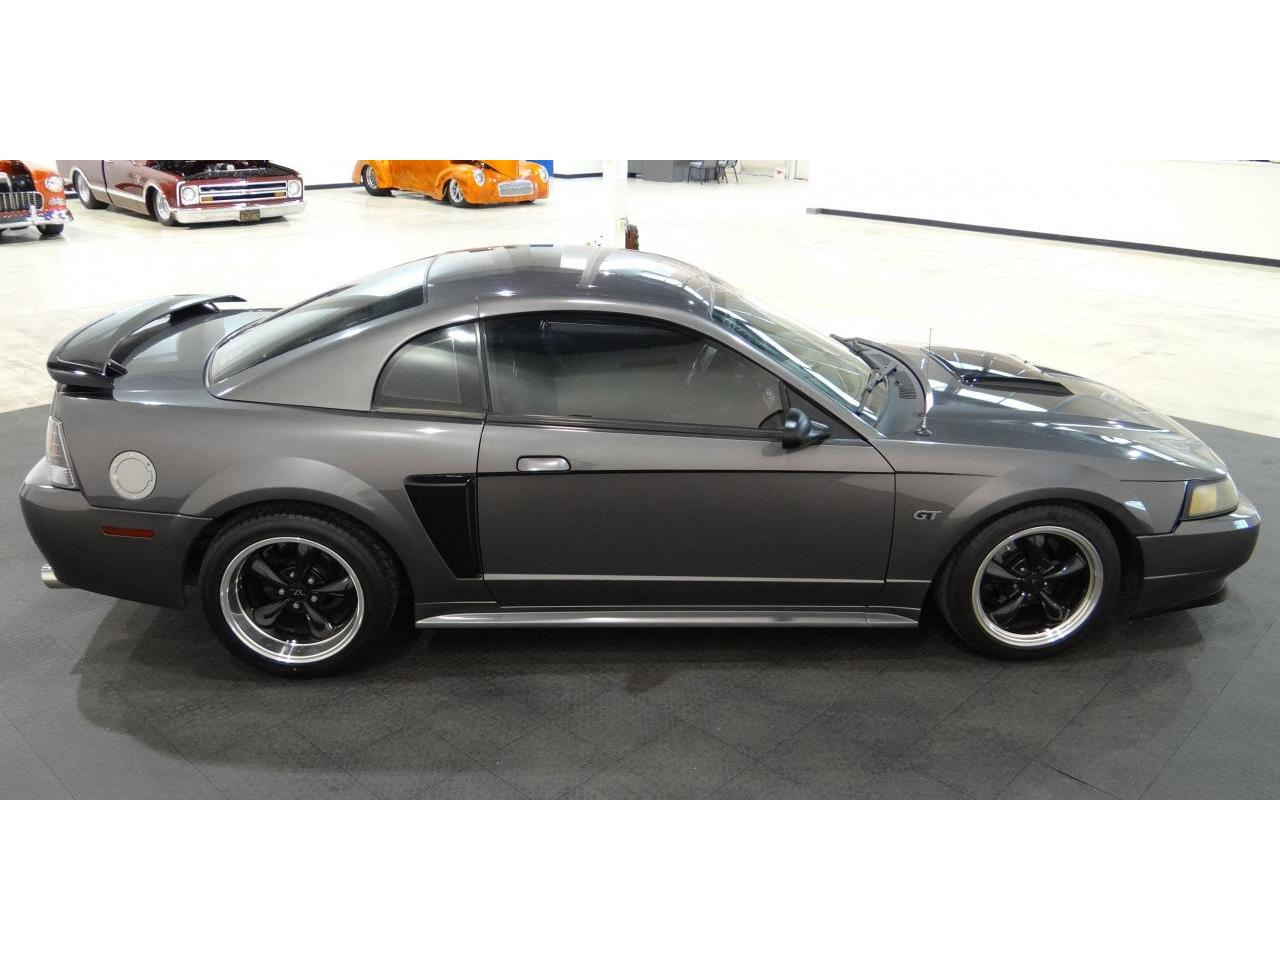 Large Picture of 2003 Mustang - $11,995.00 - KE78